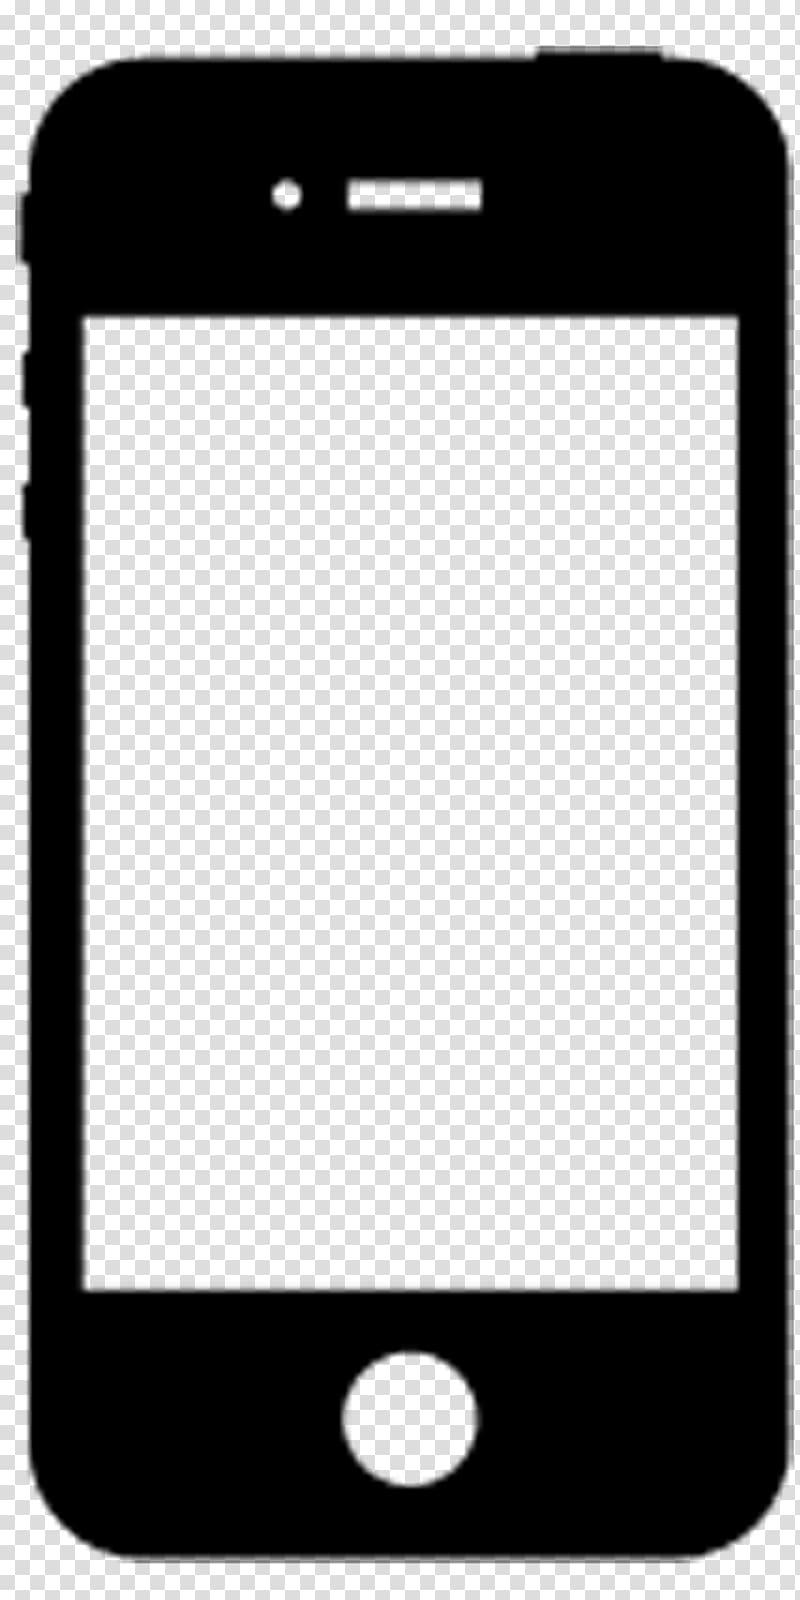 IPhone 4S iPhone 8 Template, venkateswara transparent background PNG.